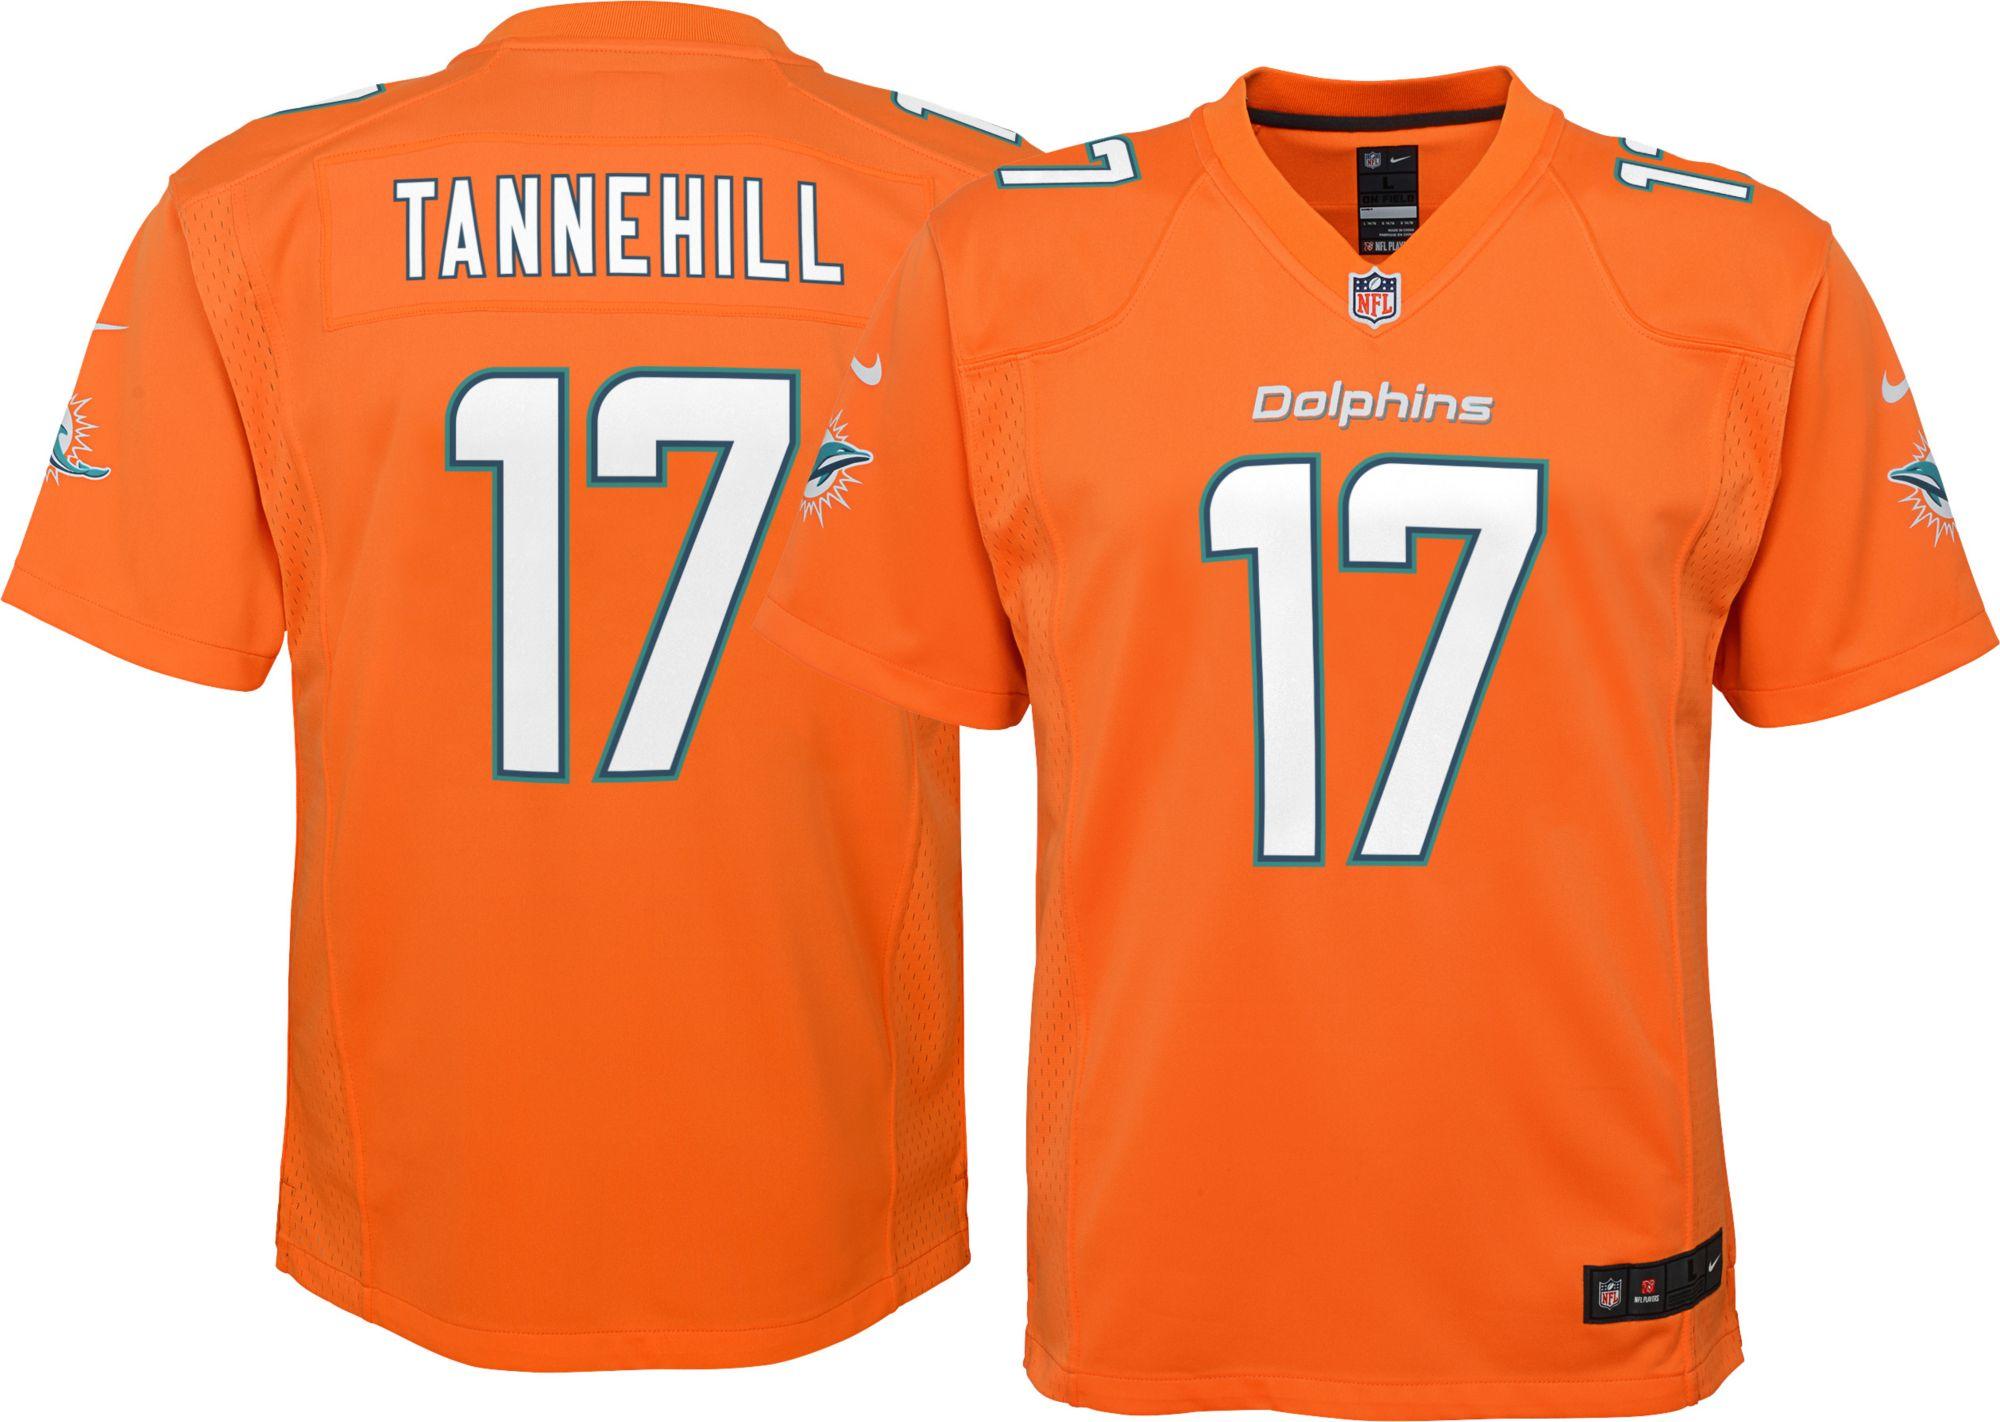 8a91472b 17 ryan tannehill jerseys llc